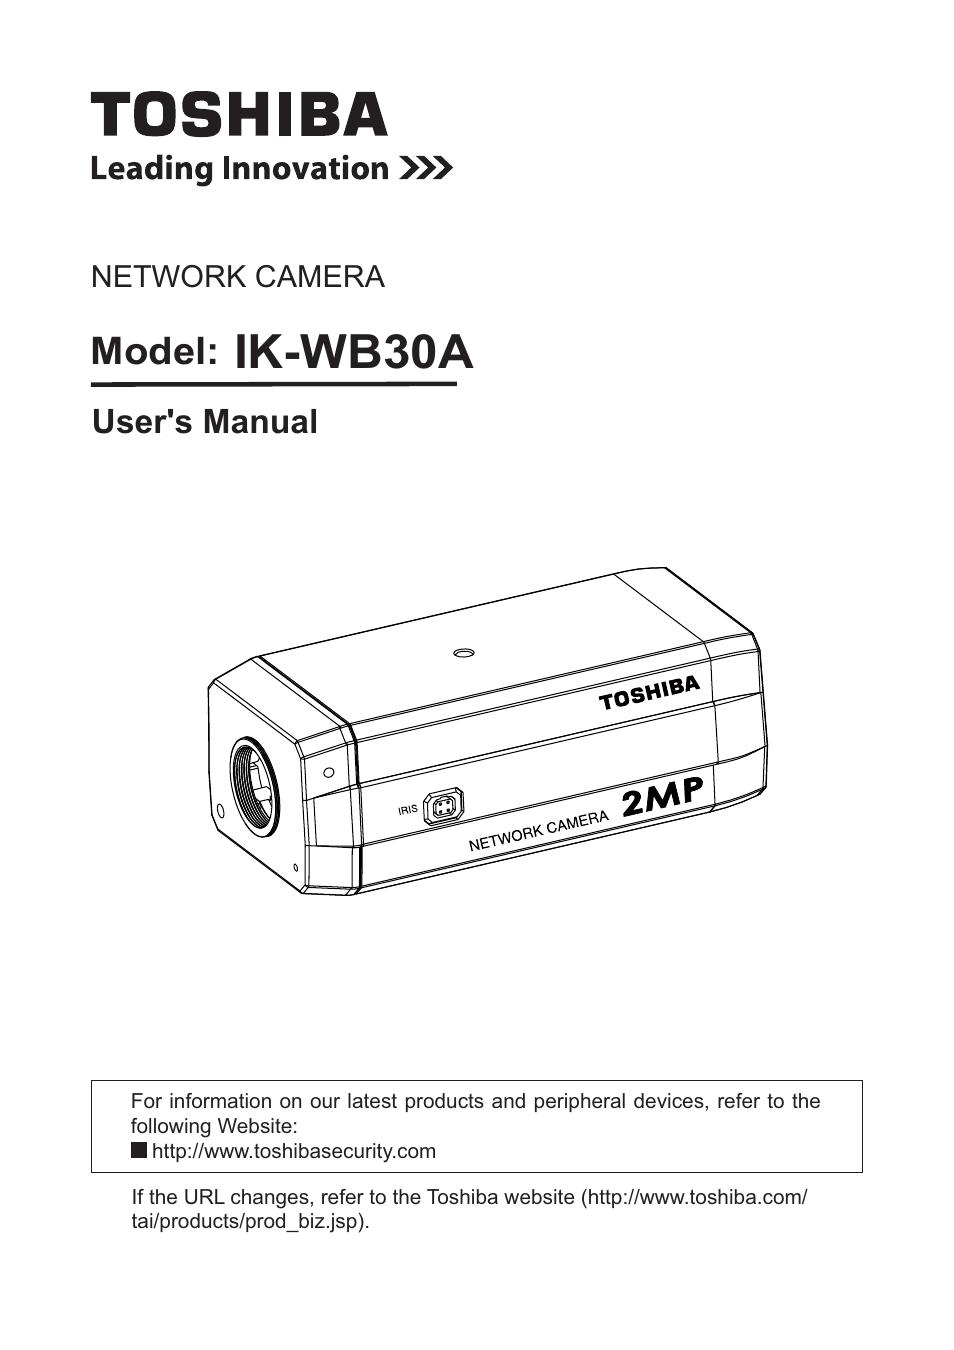 toshiba ik wb30a user manual 121 pages rh manualsdir com Toshiba CCD Color Camera Toshiba CCTV Camera